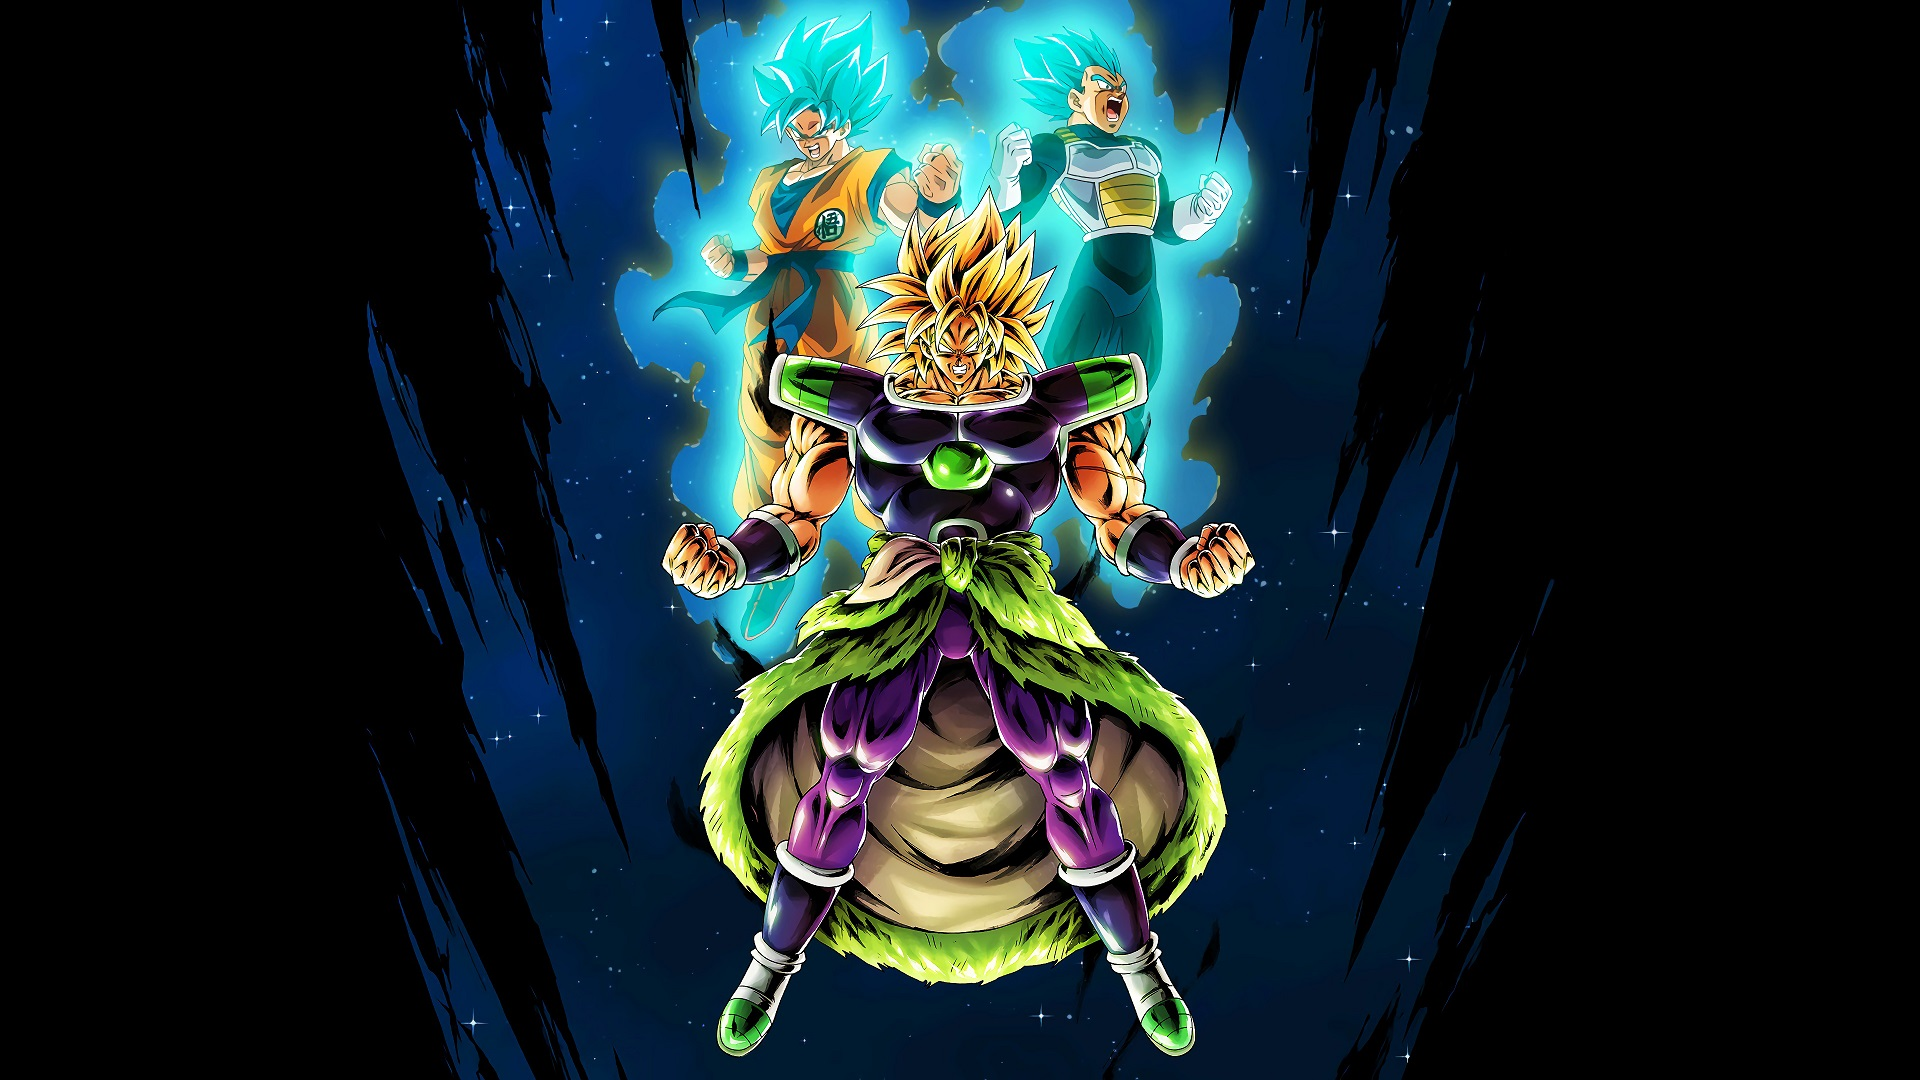 Goku vs broly fan animation - 1 5